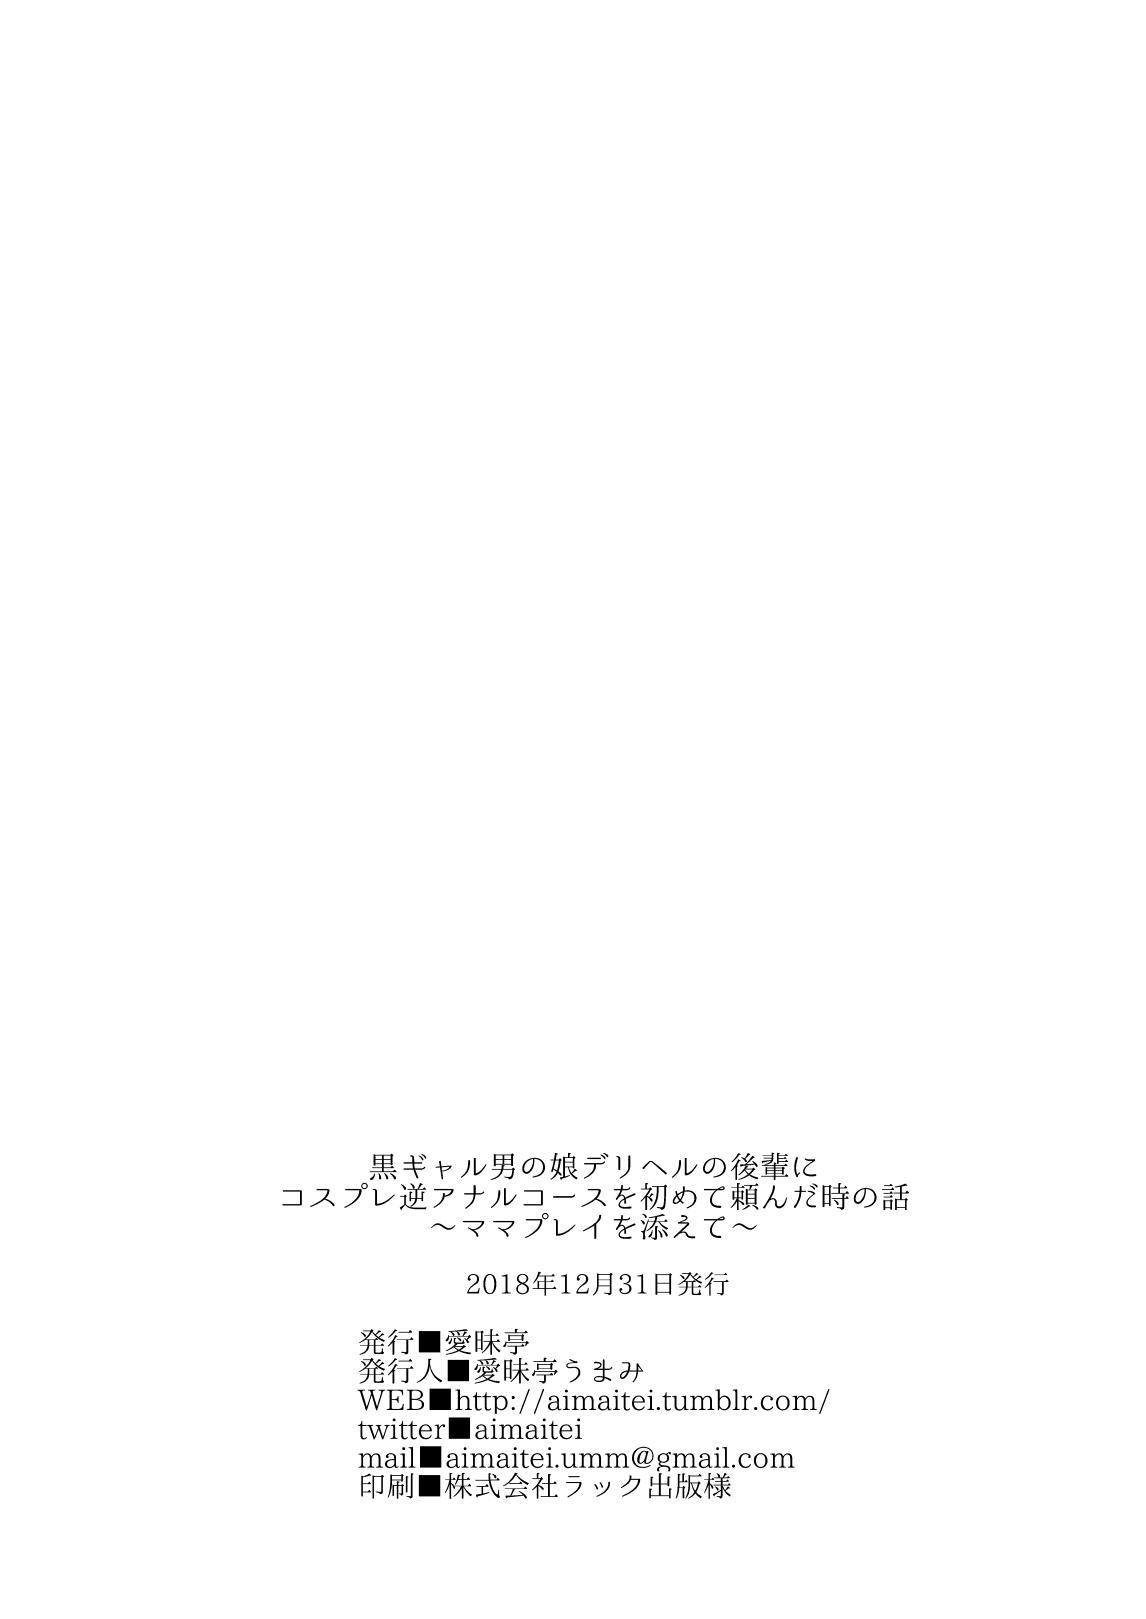 Kurogal Kouhai Otokonoko DeliHeal ~ Gyaku Anal Course 25